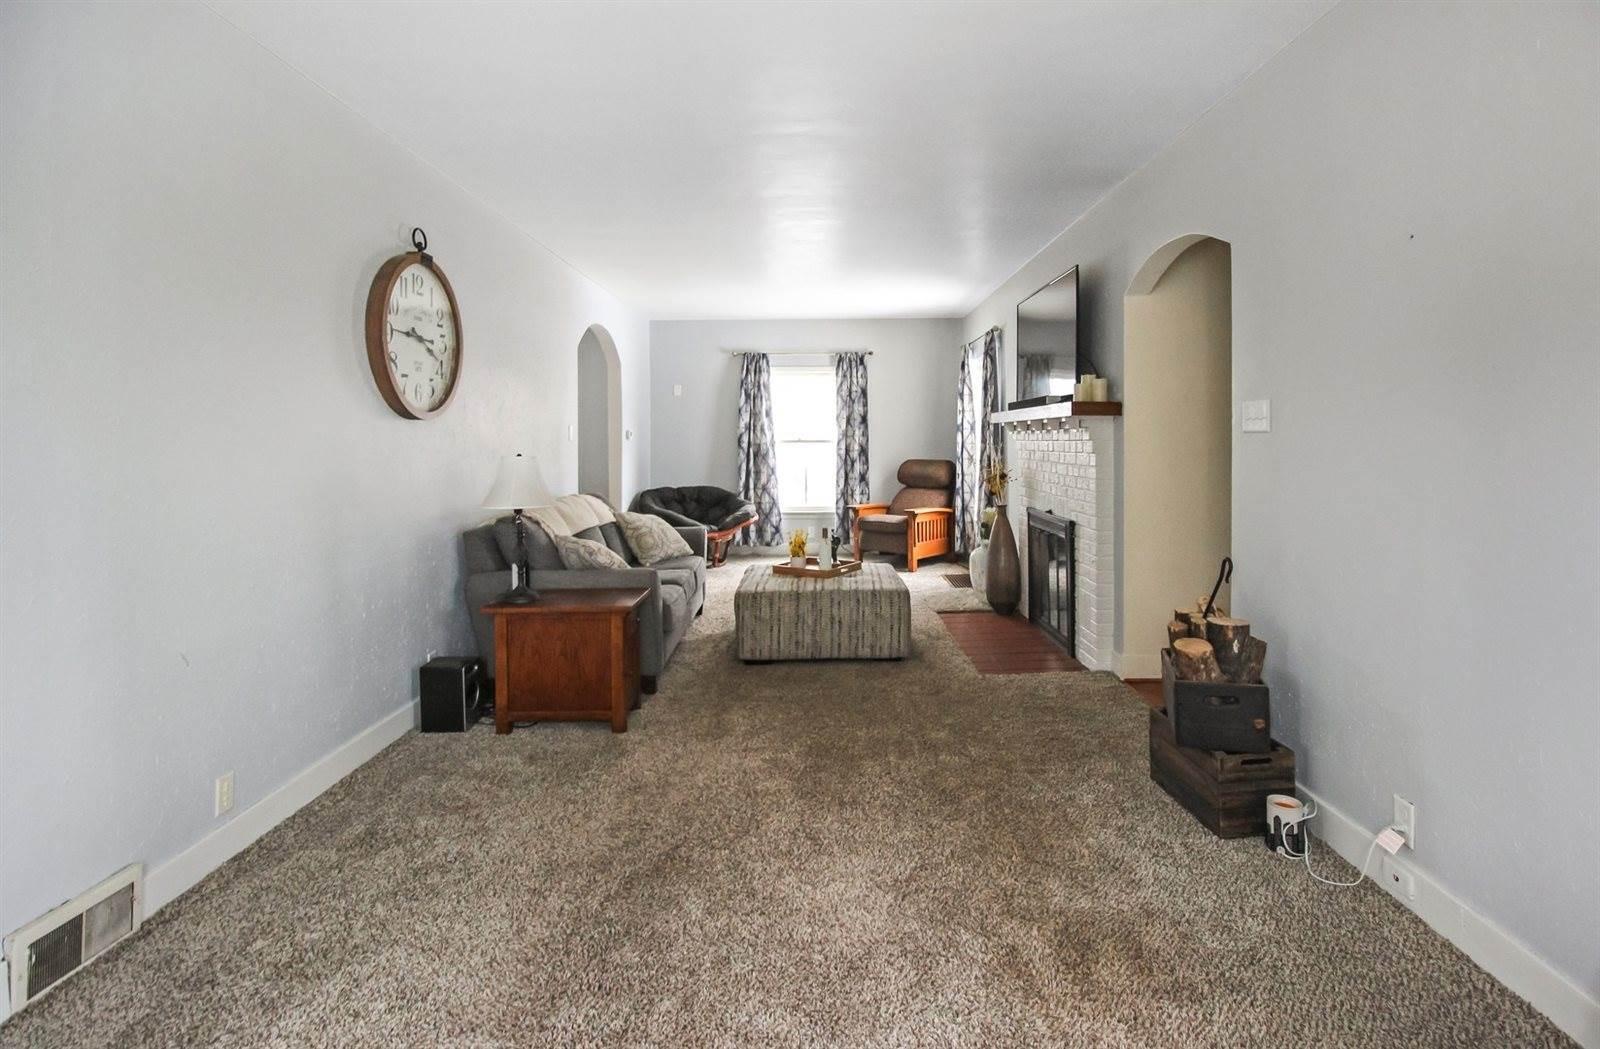 1351 Stover, Freeport, IL 61032